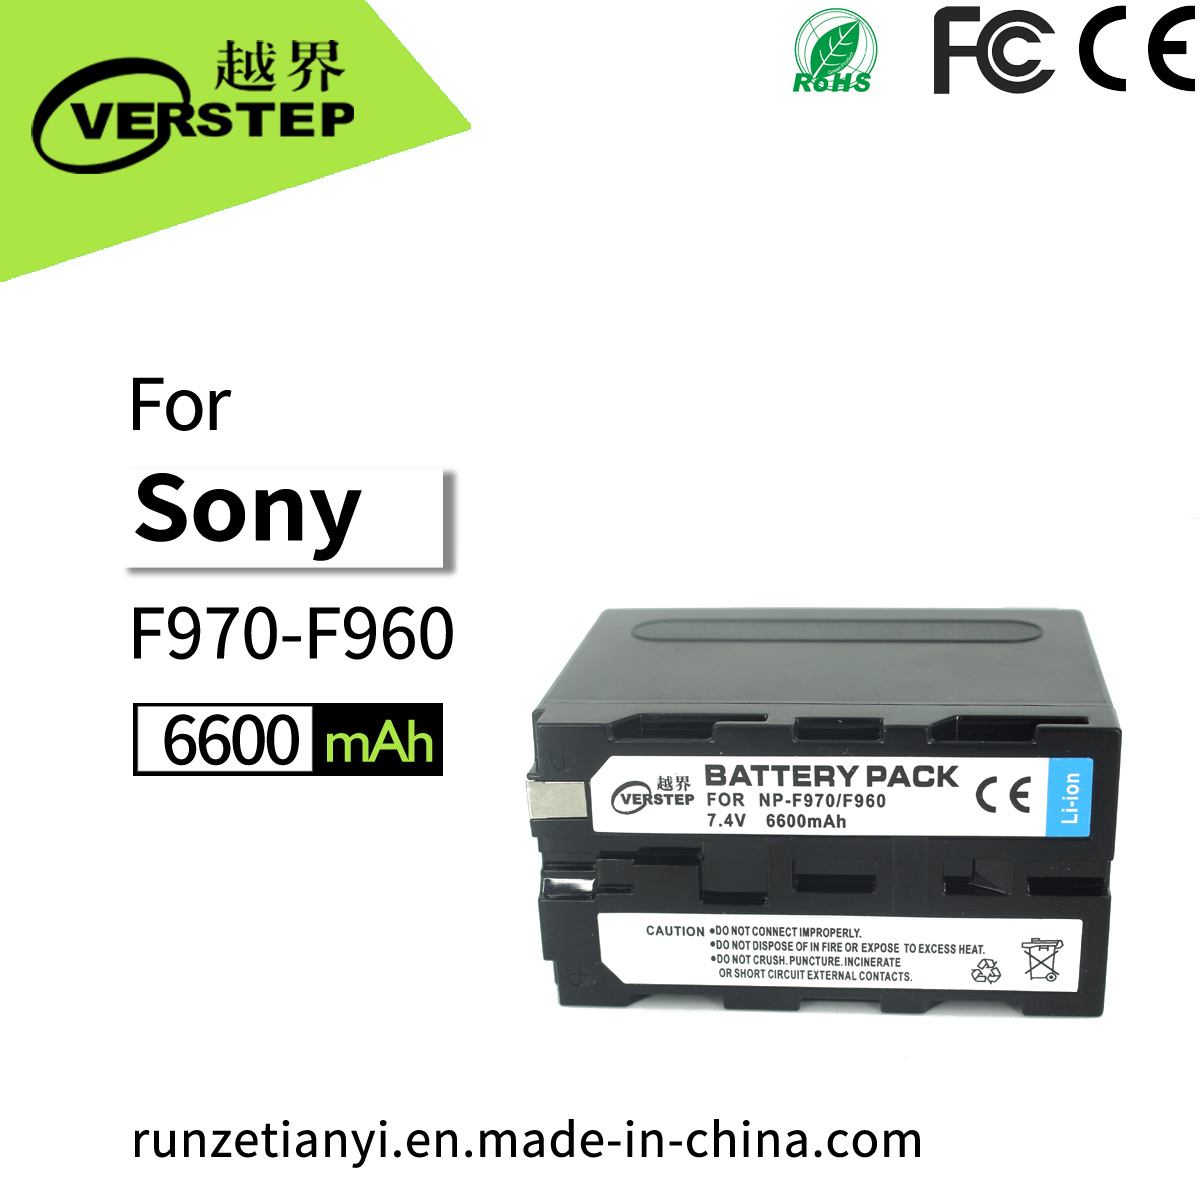 Li-ion Battery for Sony HDR-FX1E DCR-TRV130E CCD-TR818 CCD-TRV94E CCD-TR300 NEW